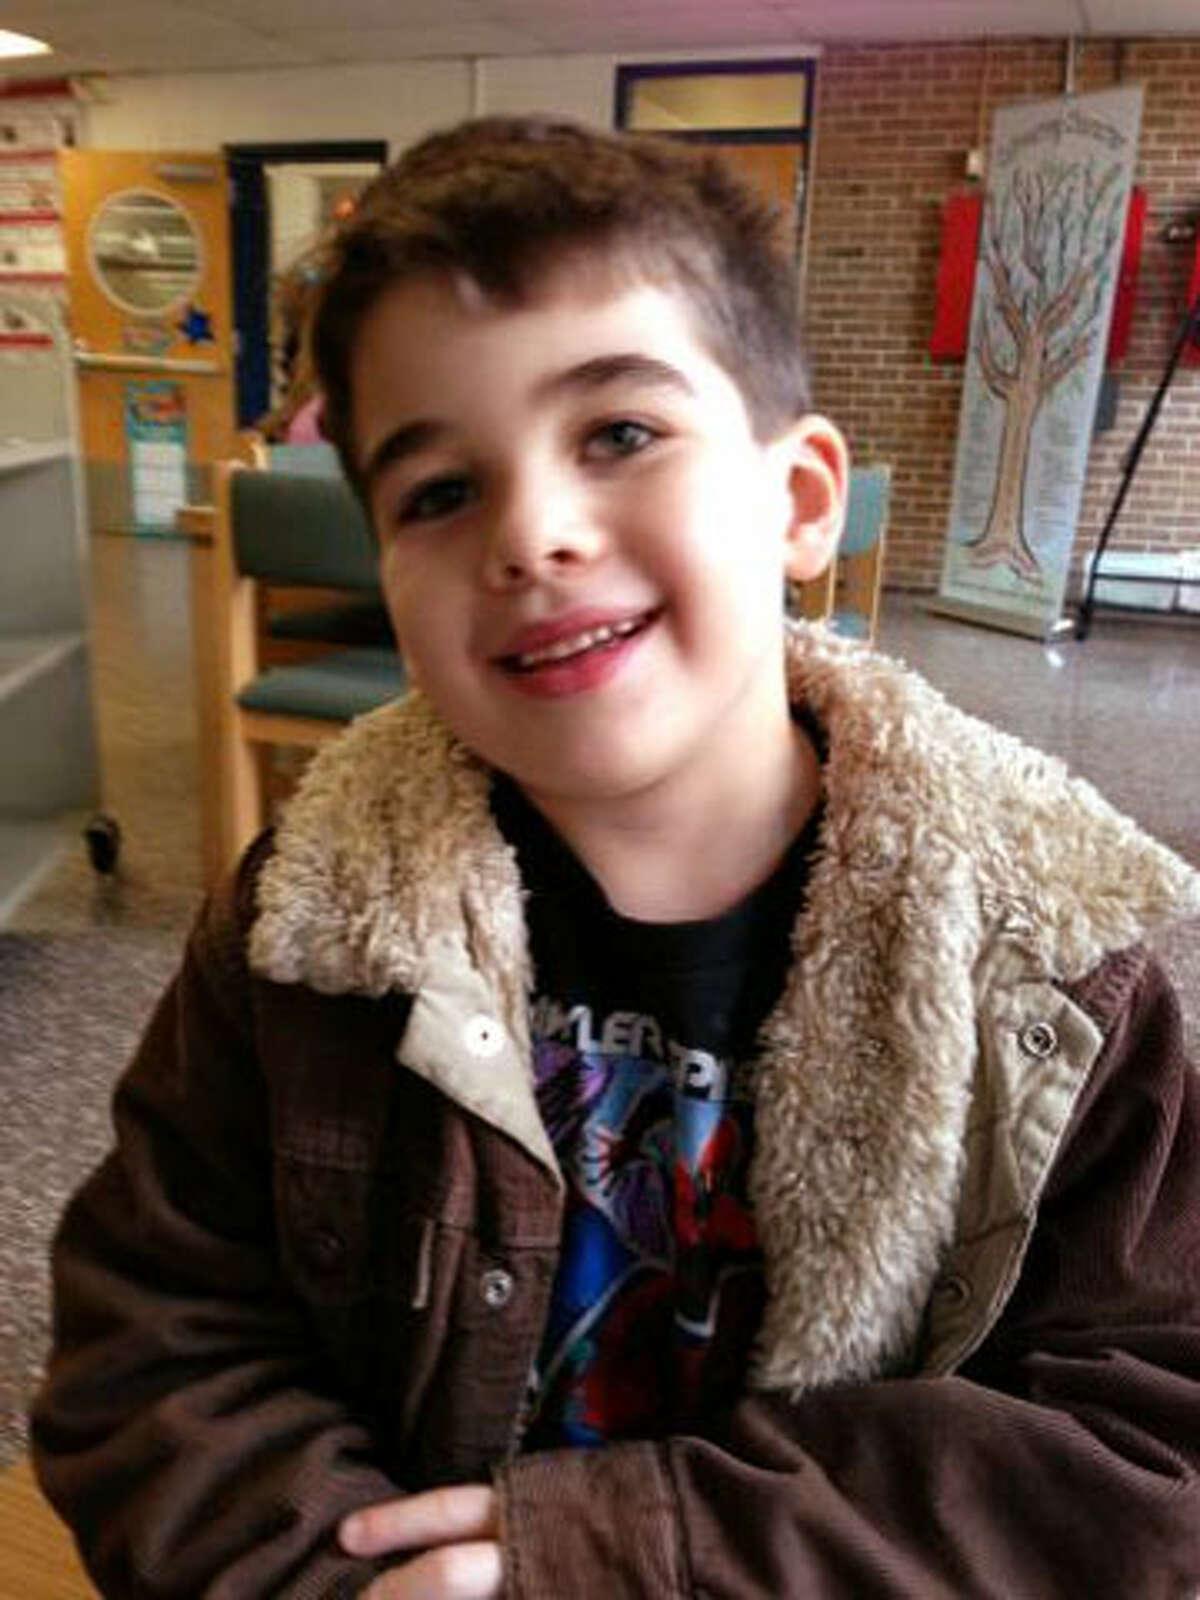 Noah Pozner died in the Sandy Hook Elementary School shooting in Newtown, Conn. on Friday, Dec. 14, 2012.